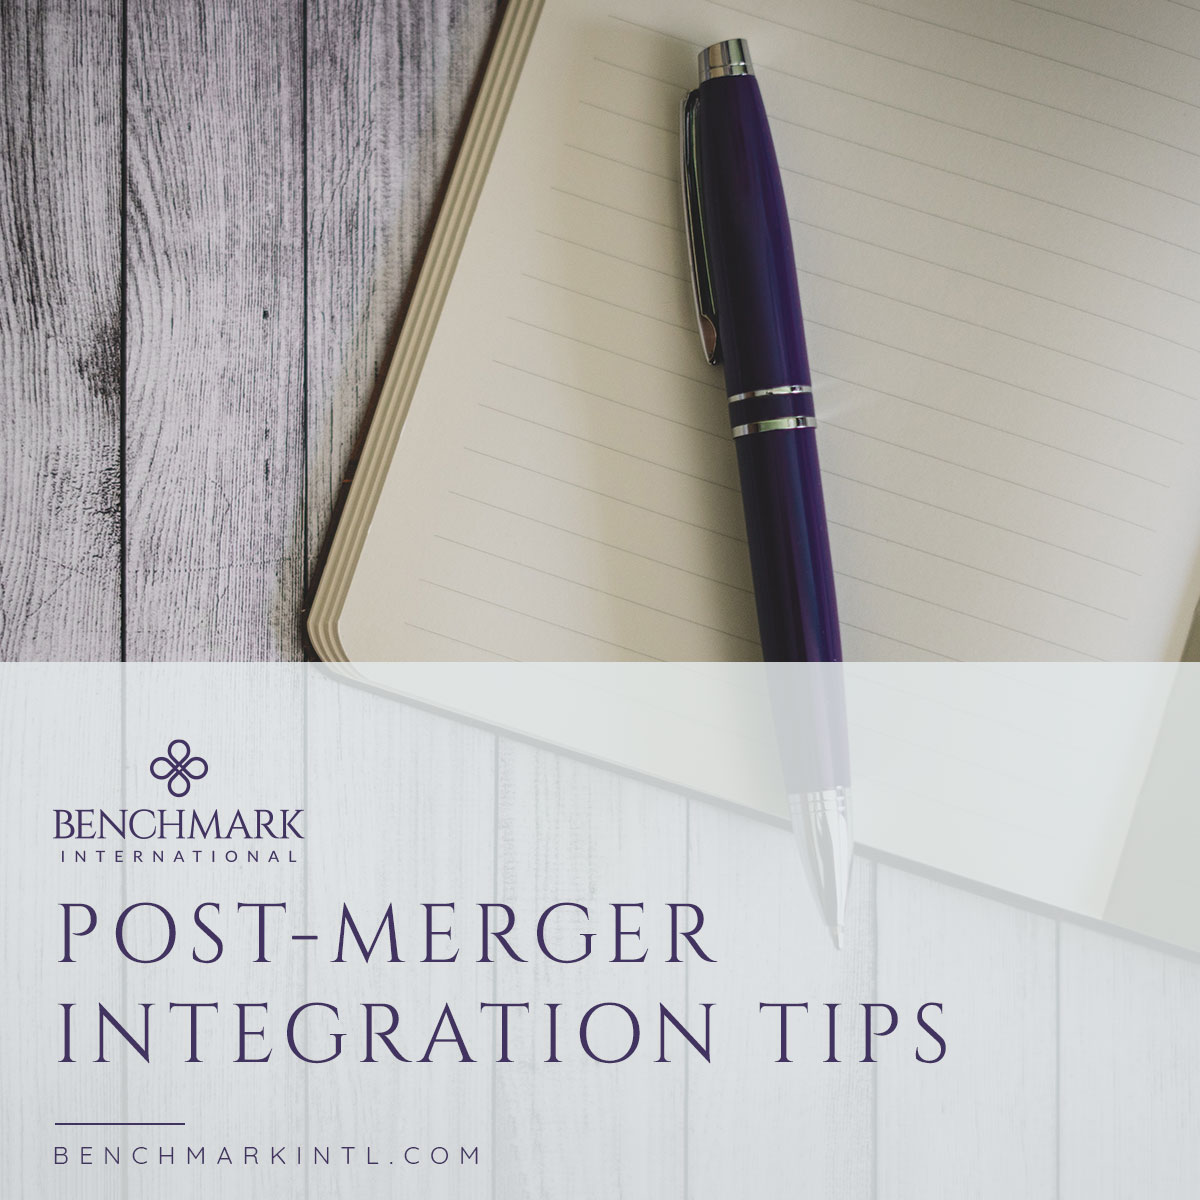 Post_merger_Integration_tips_social